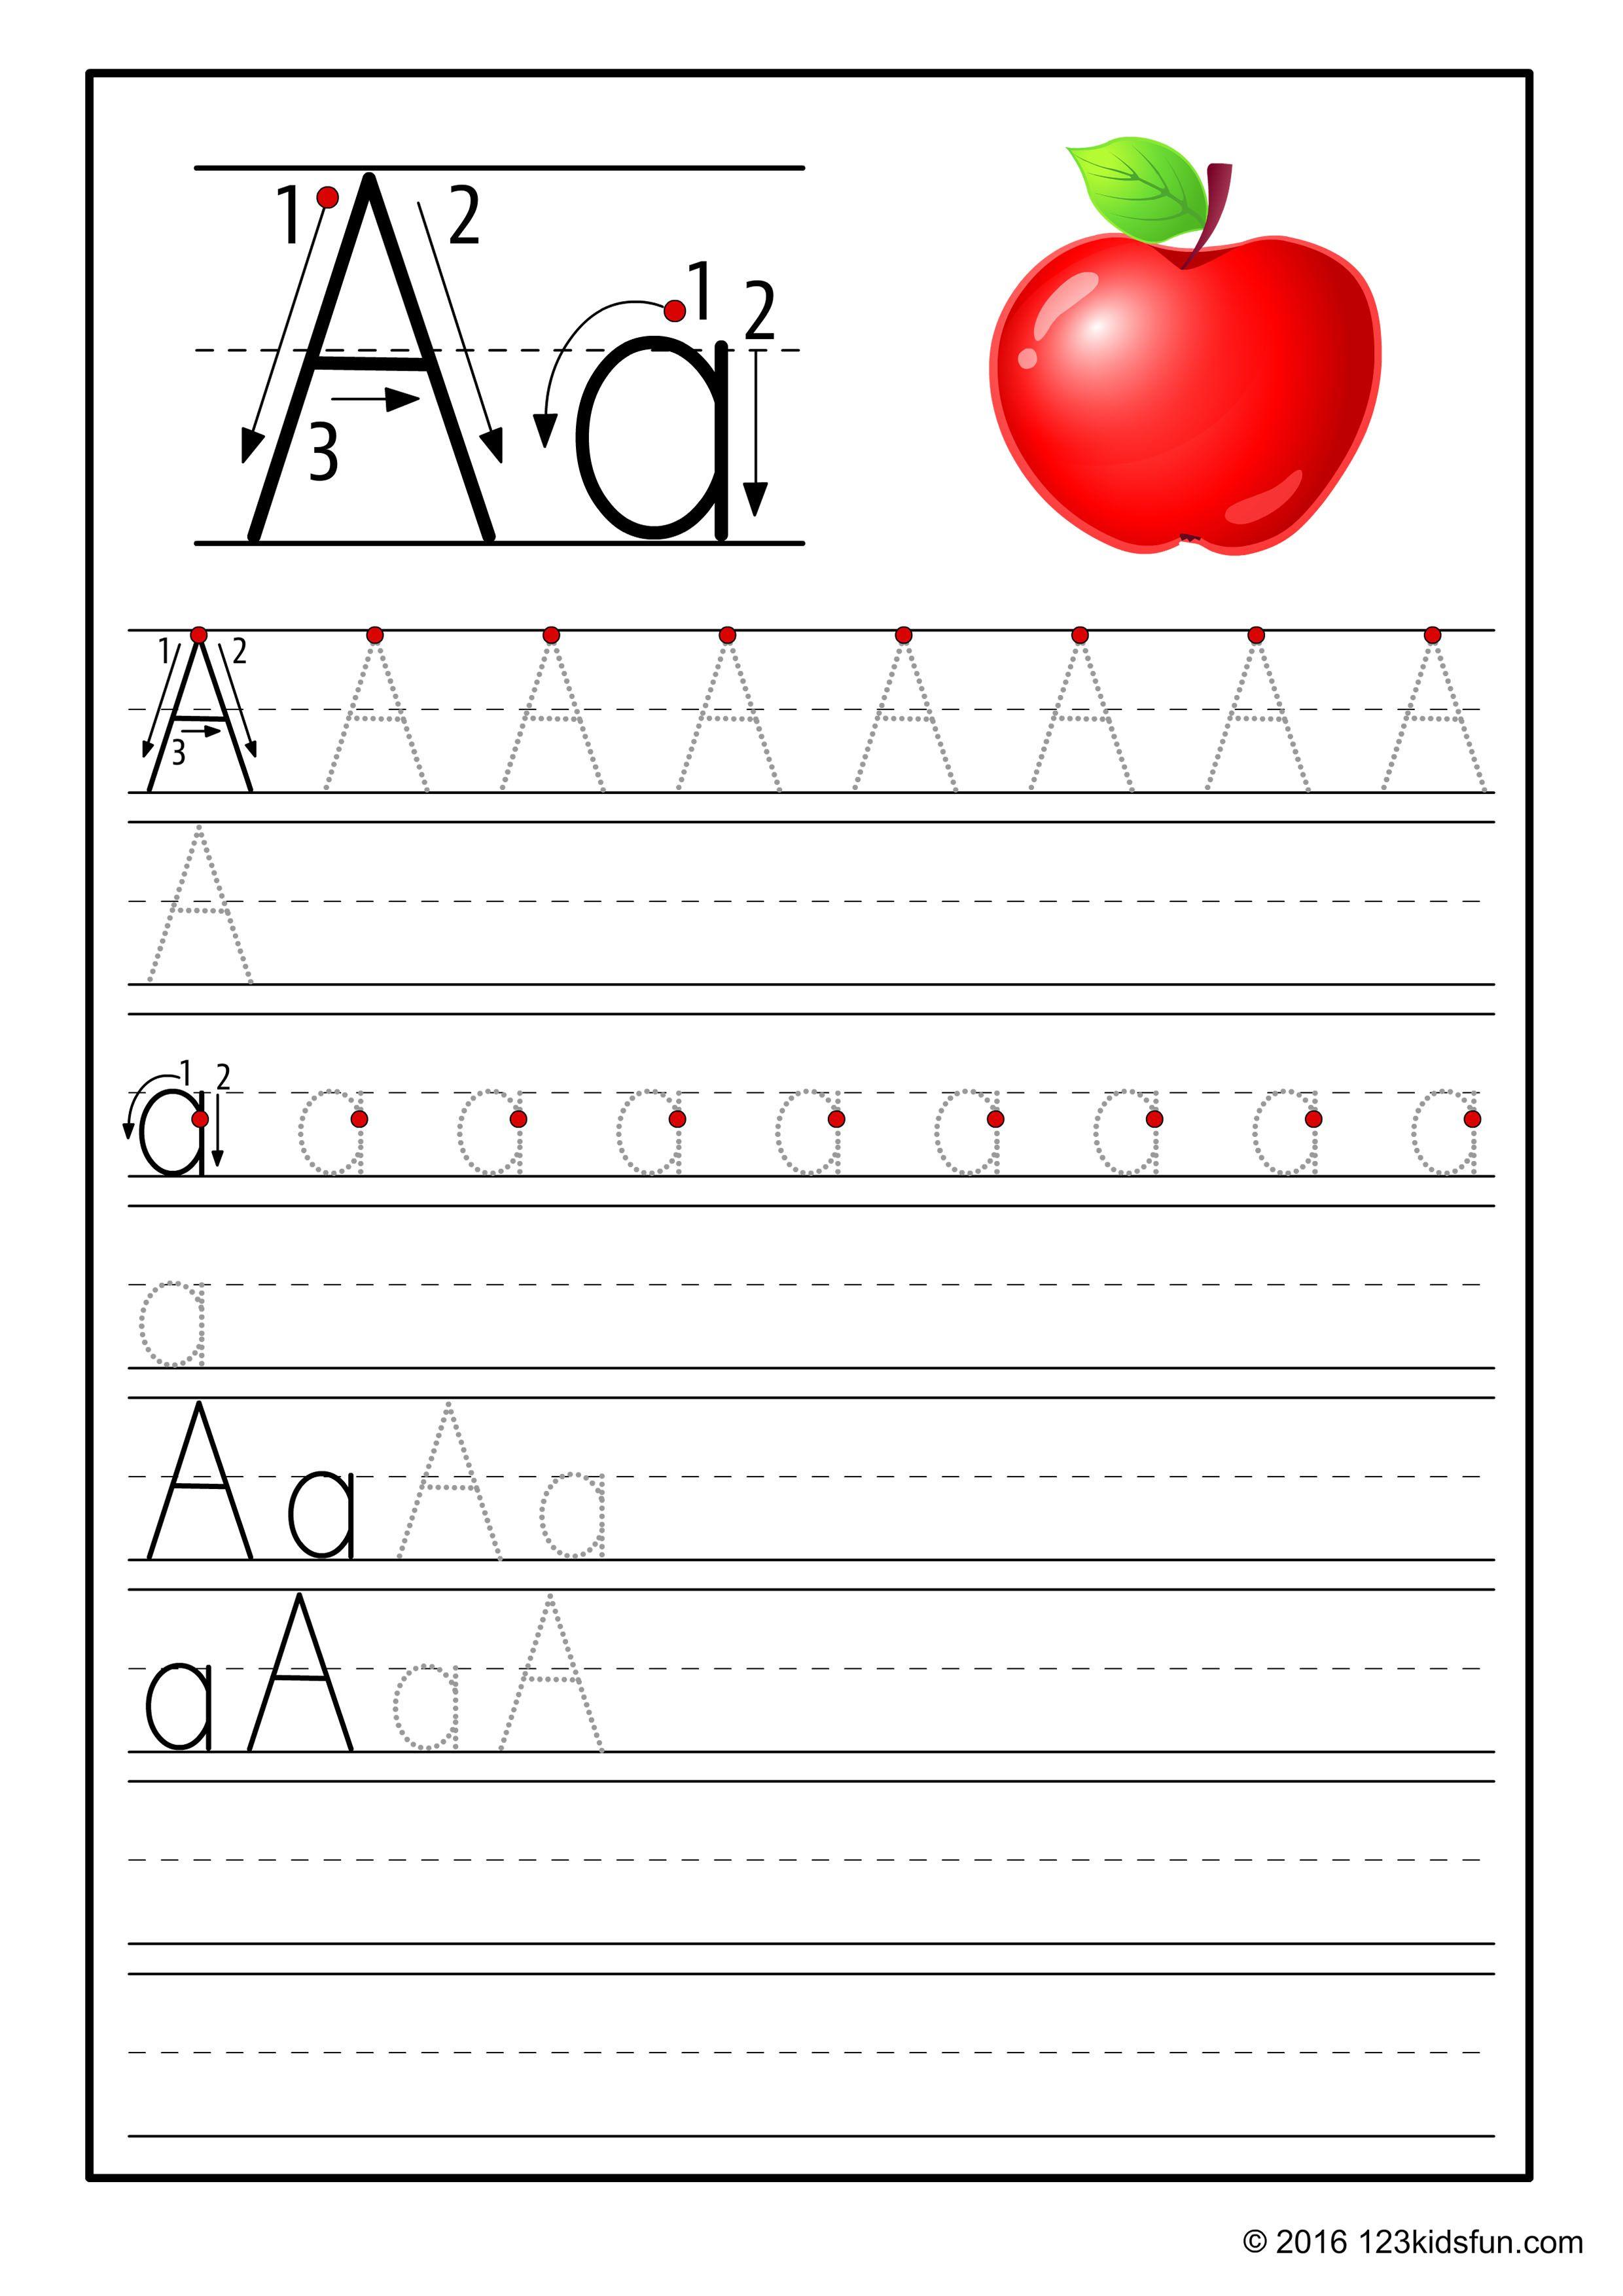 123kidsfun Com Alphabet 1